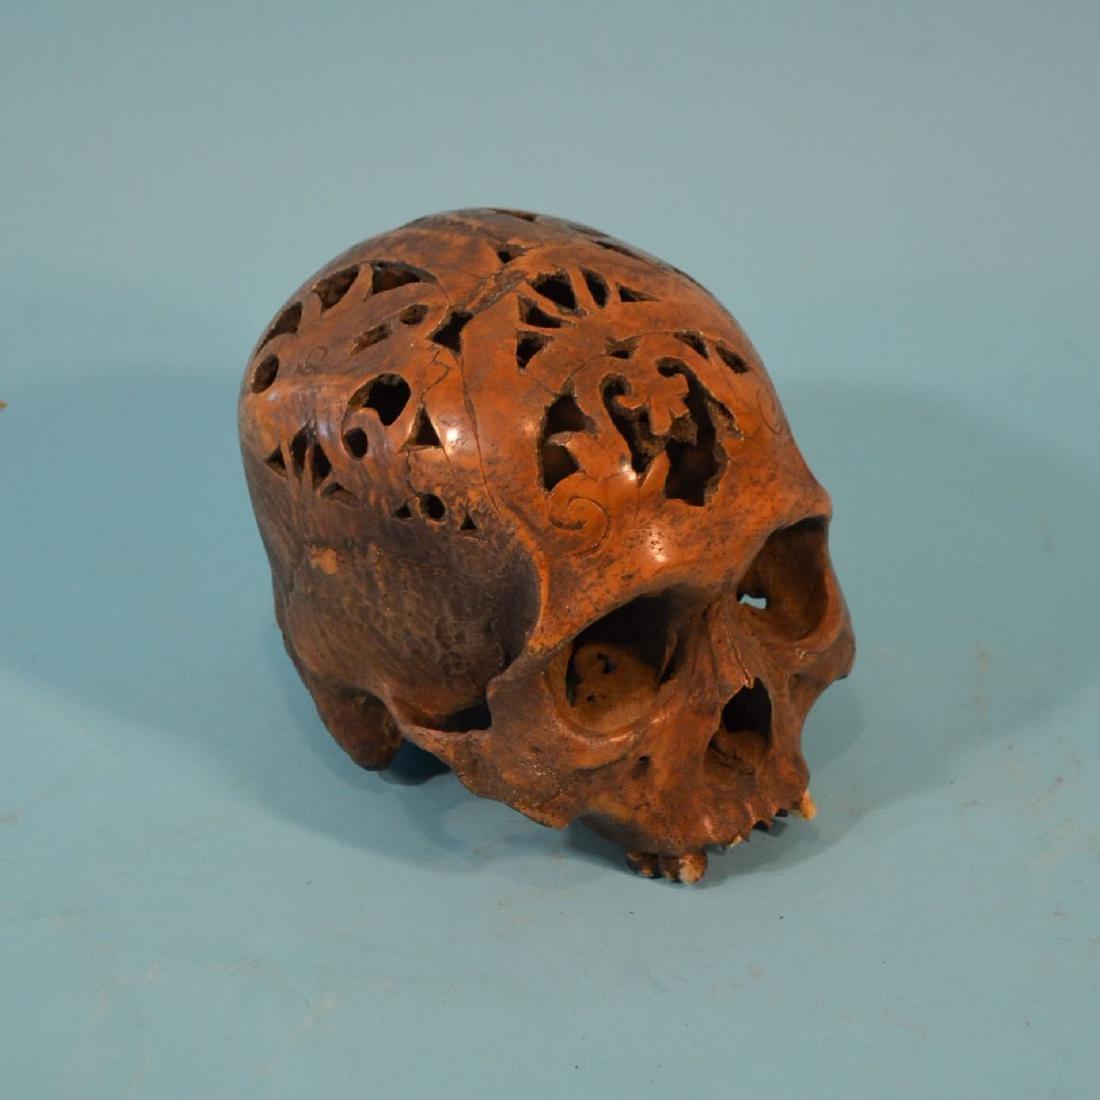 Carved Dayak Headhunting Trophy Skull